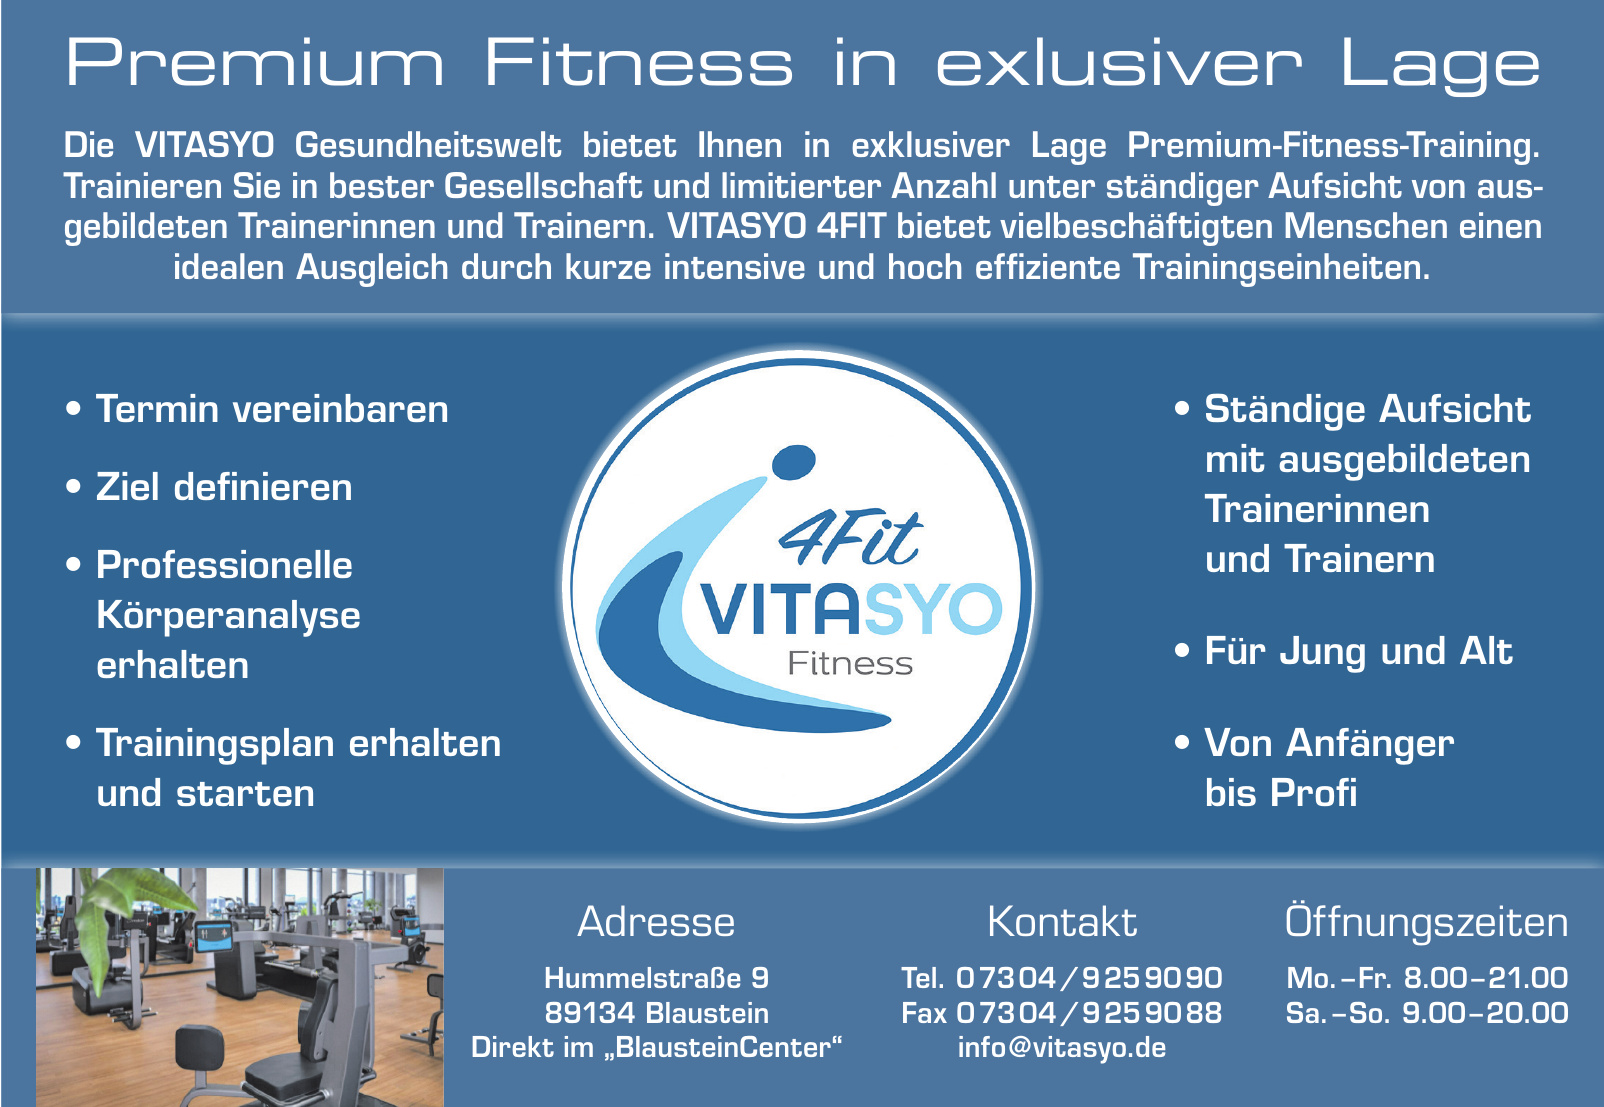 4Fit Vitasyo Fitness